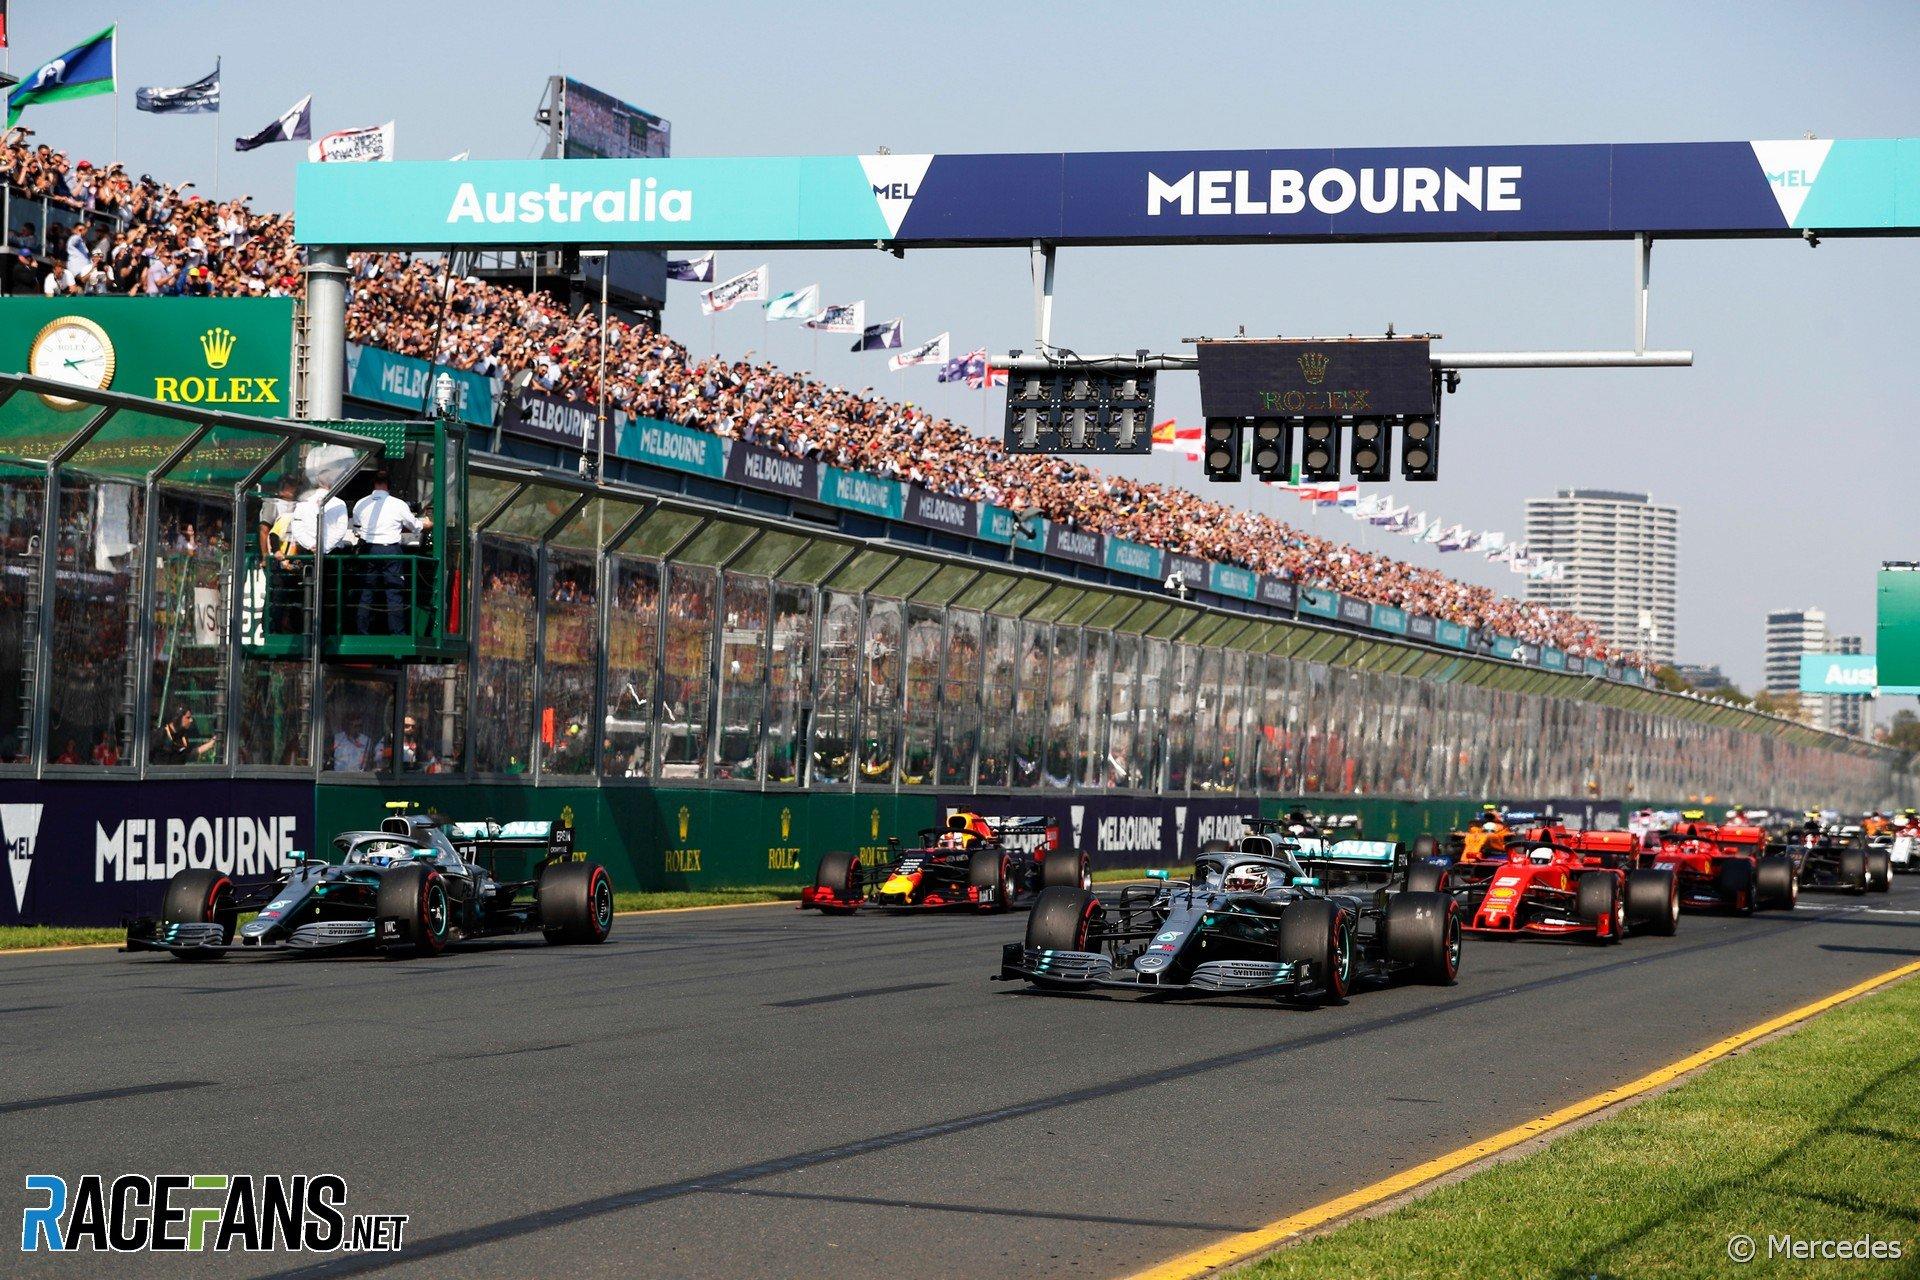 2019 F1 Calendar: Formula One Race Schedule – Racefans Formula 1 Calendar 2019 Dates